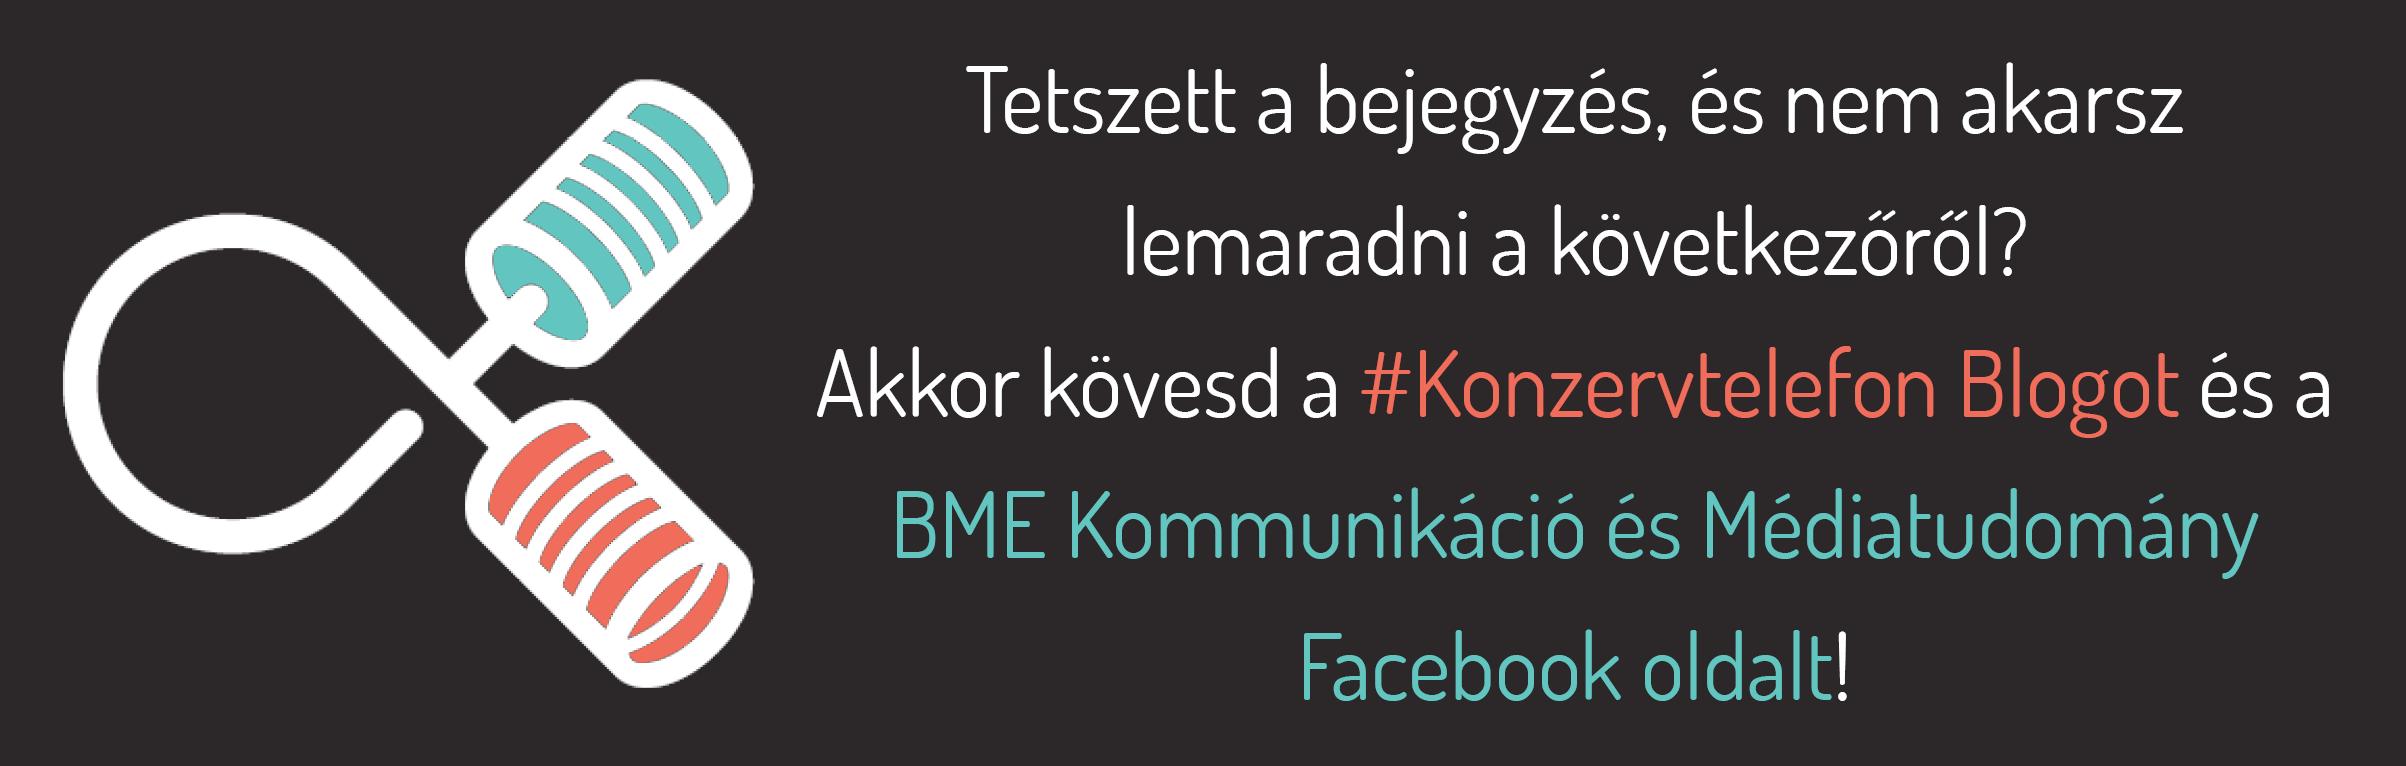 konzerv_1.png